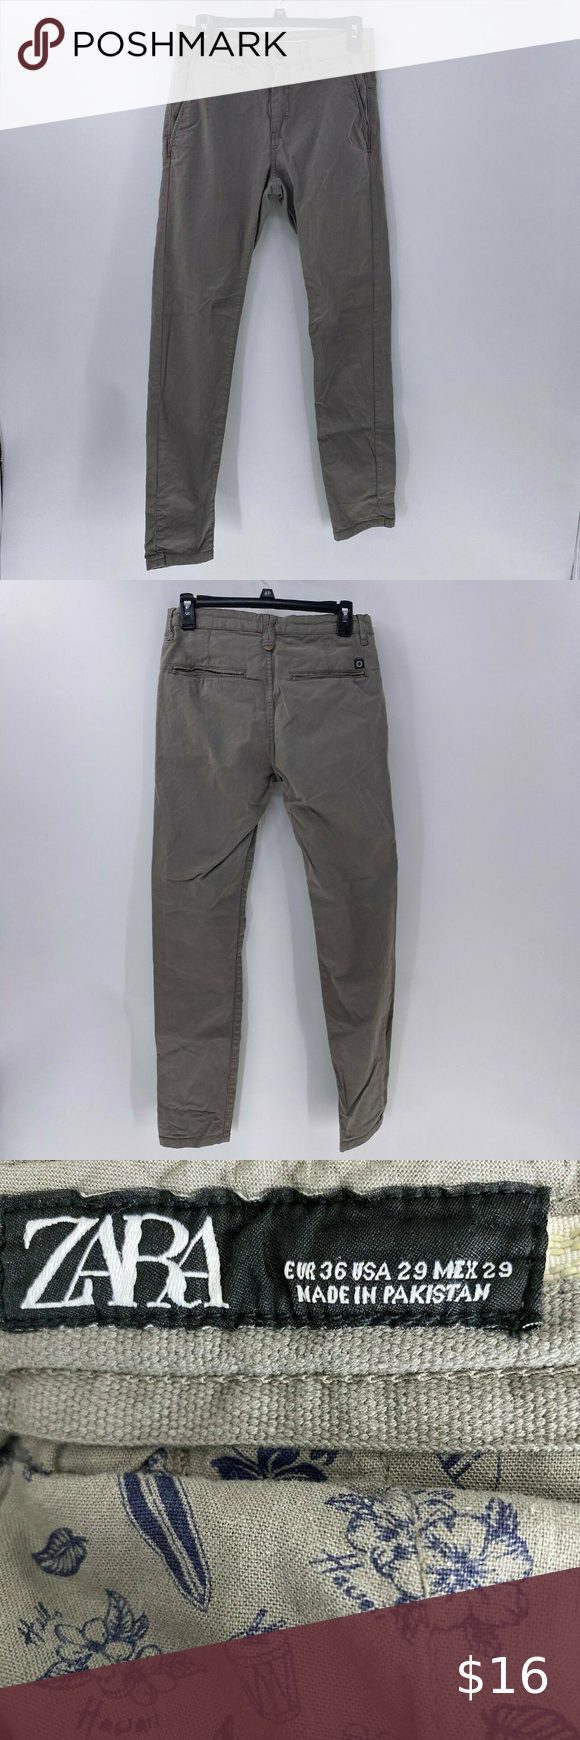 "Zara mens skinny chino pants gray sz 29 Zara mens skinny chino pants gray sz 29 10"" rise 31"" inseam"